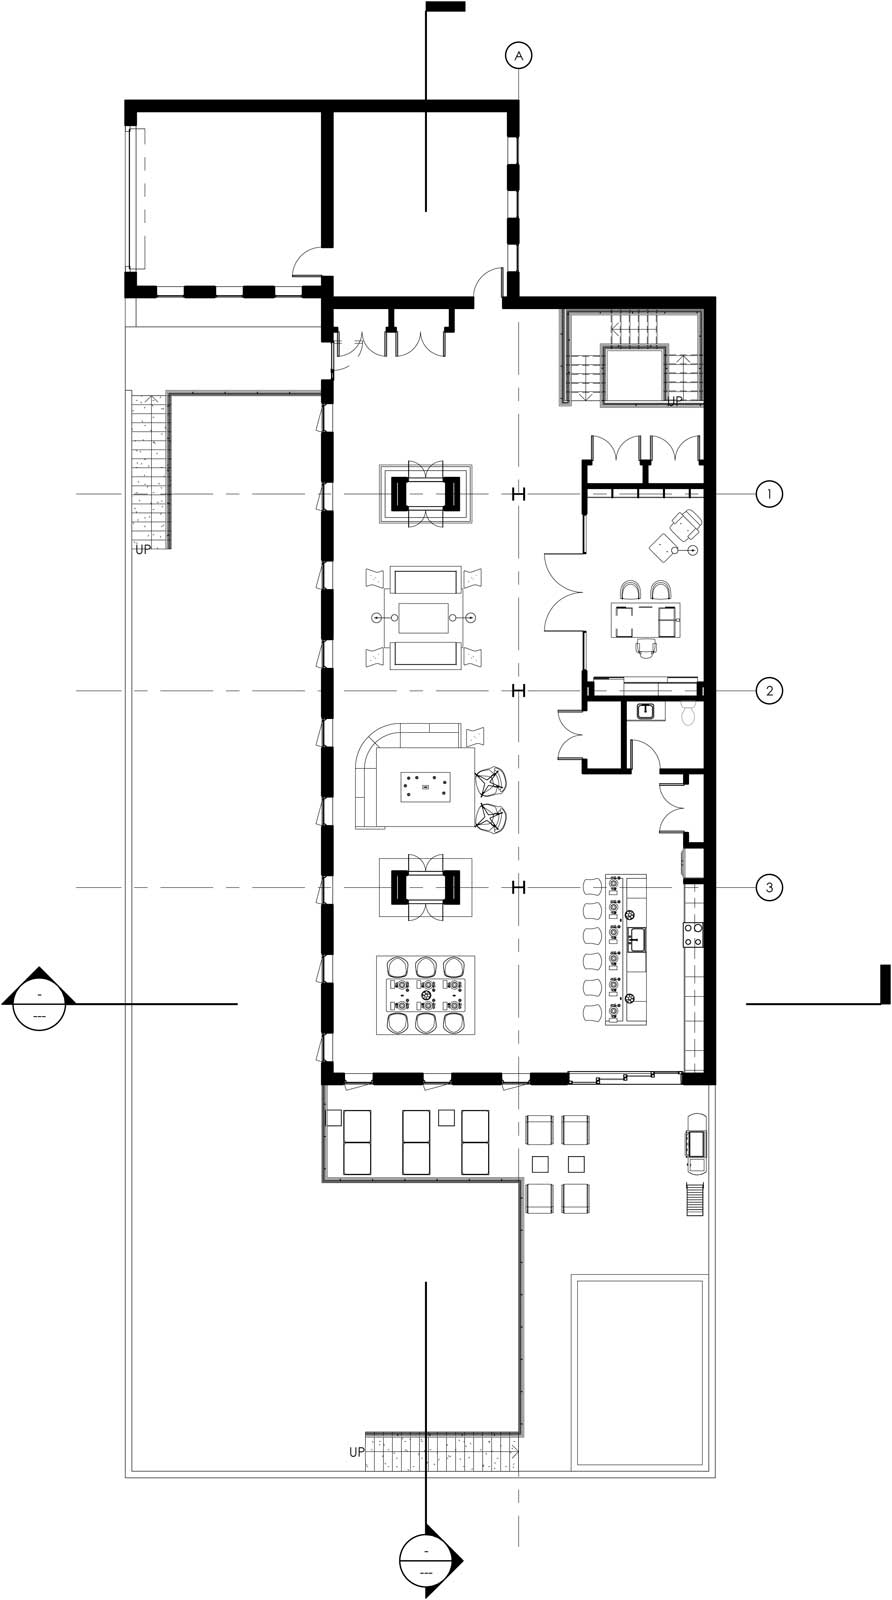 17x30-Ground-Floor-Plan.jpg